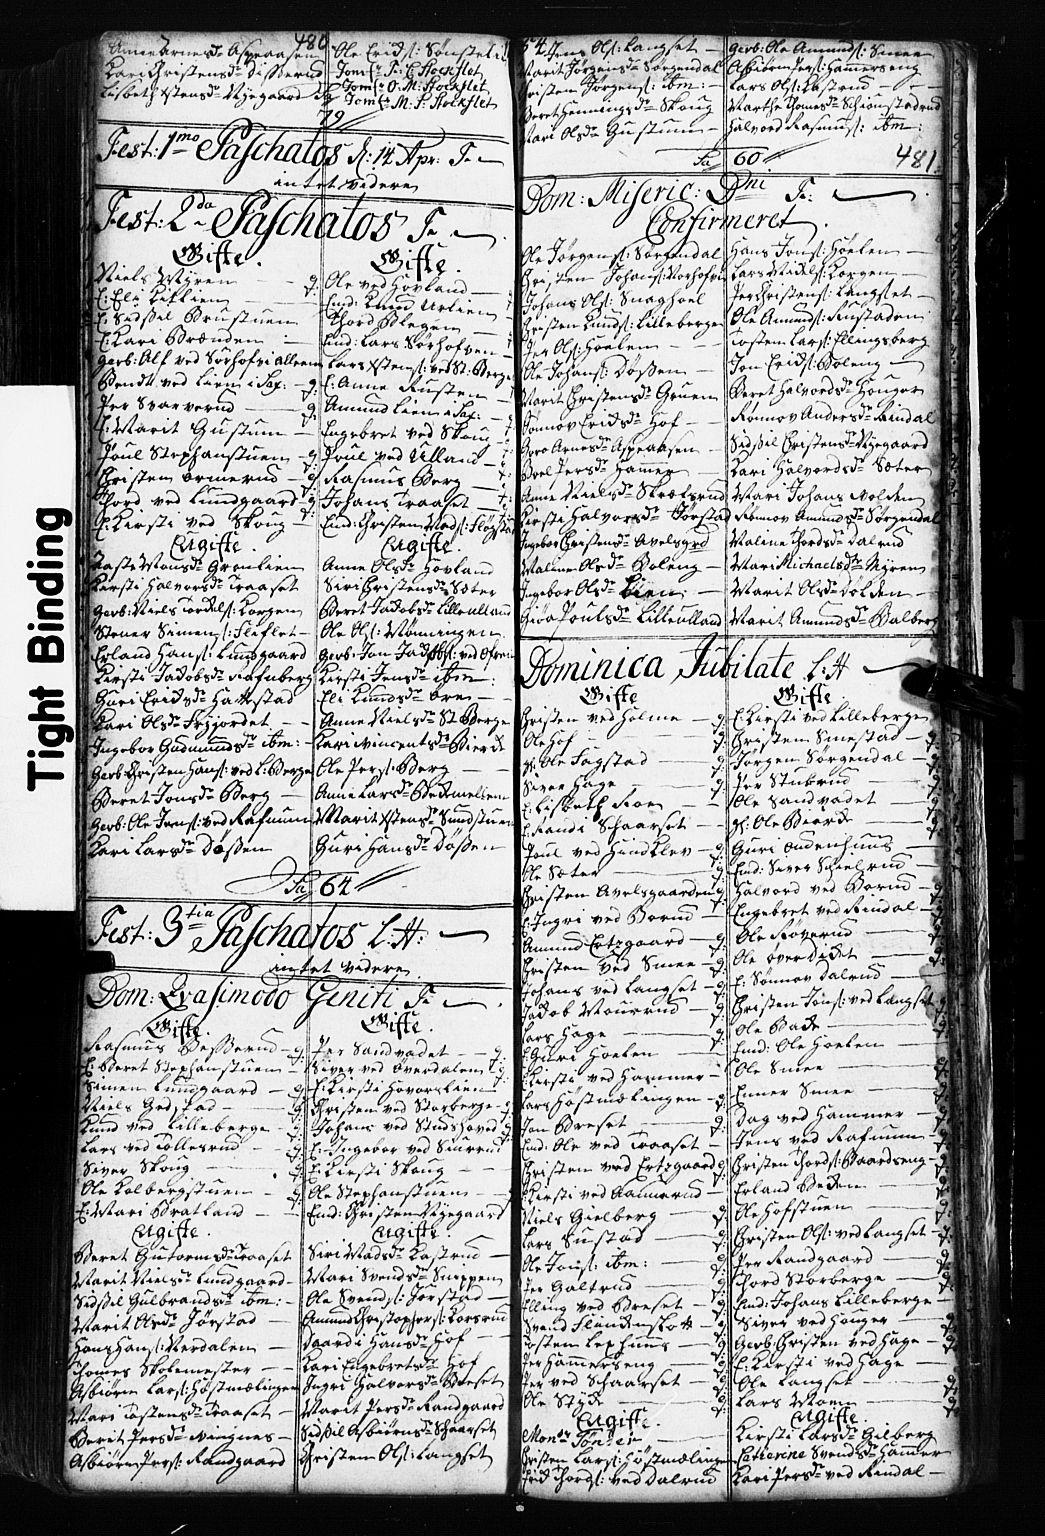 SAH, Fåberg prestekontor, Klokkerbok nr. 2, 1741-1756, s. 480-481